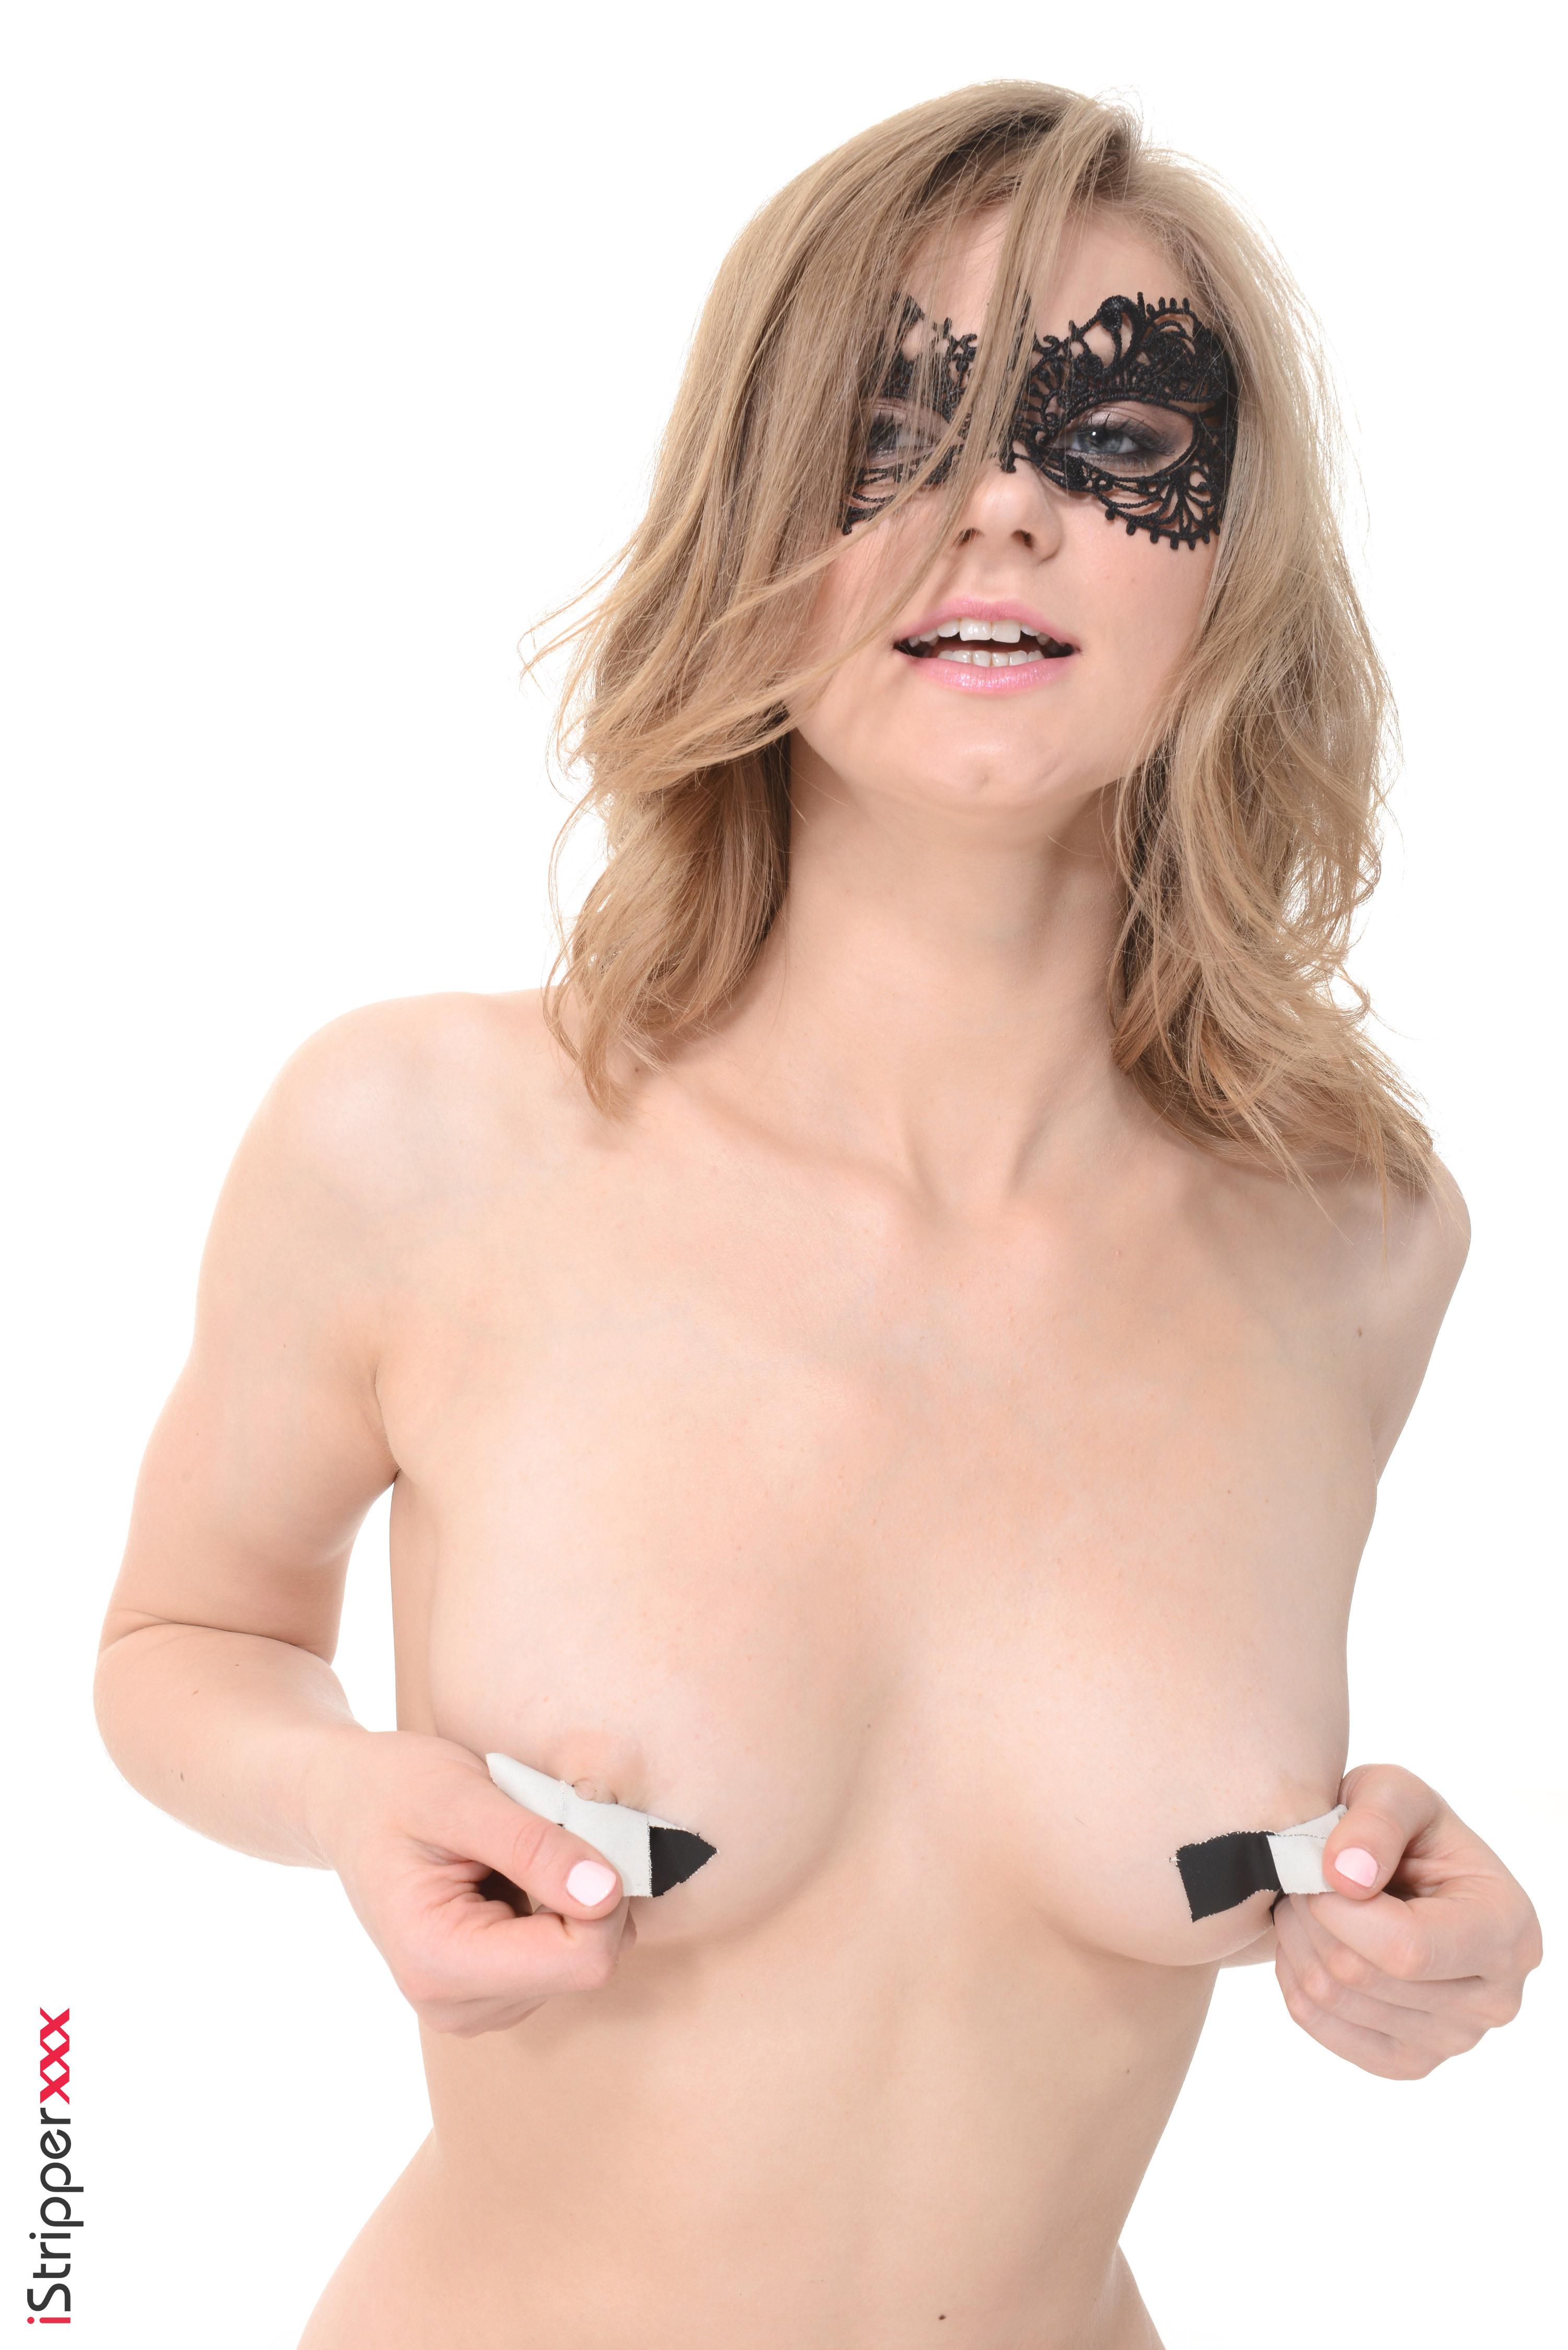 virtual stripping